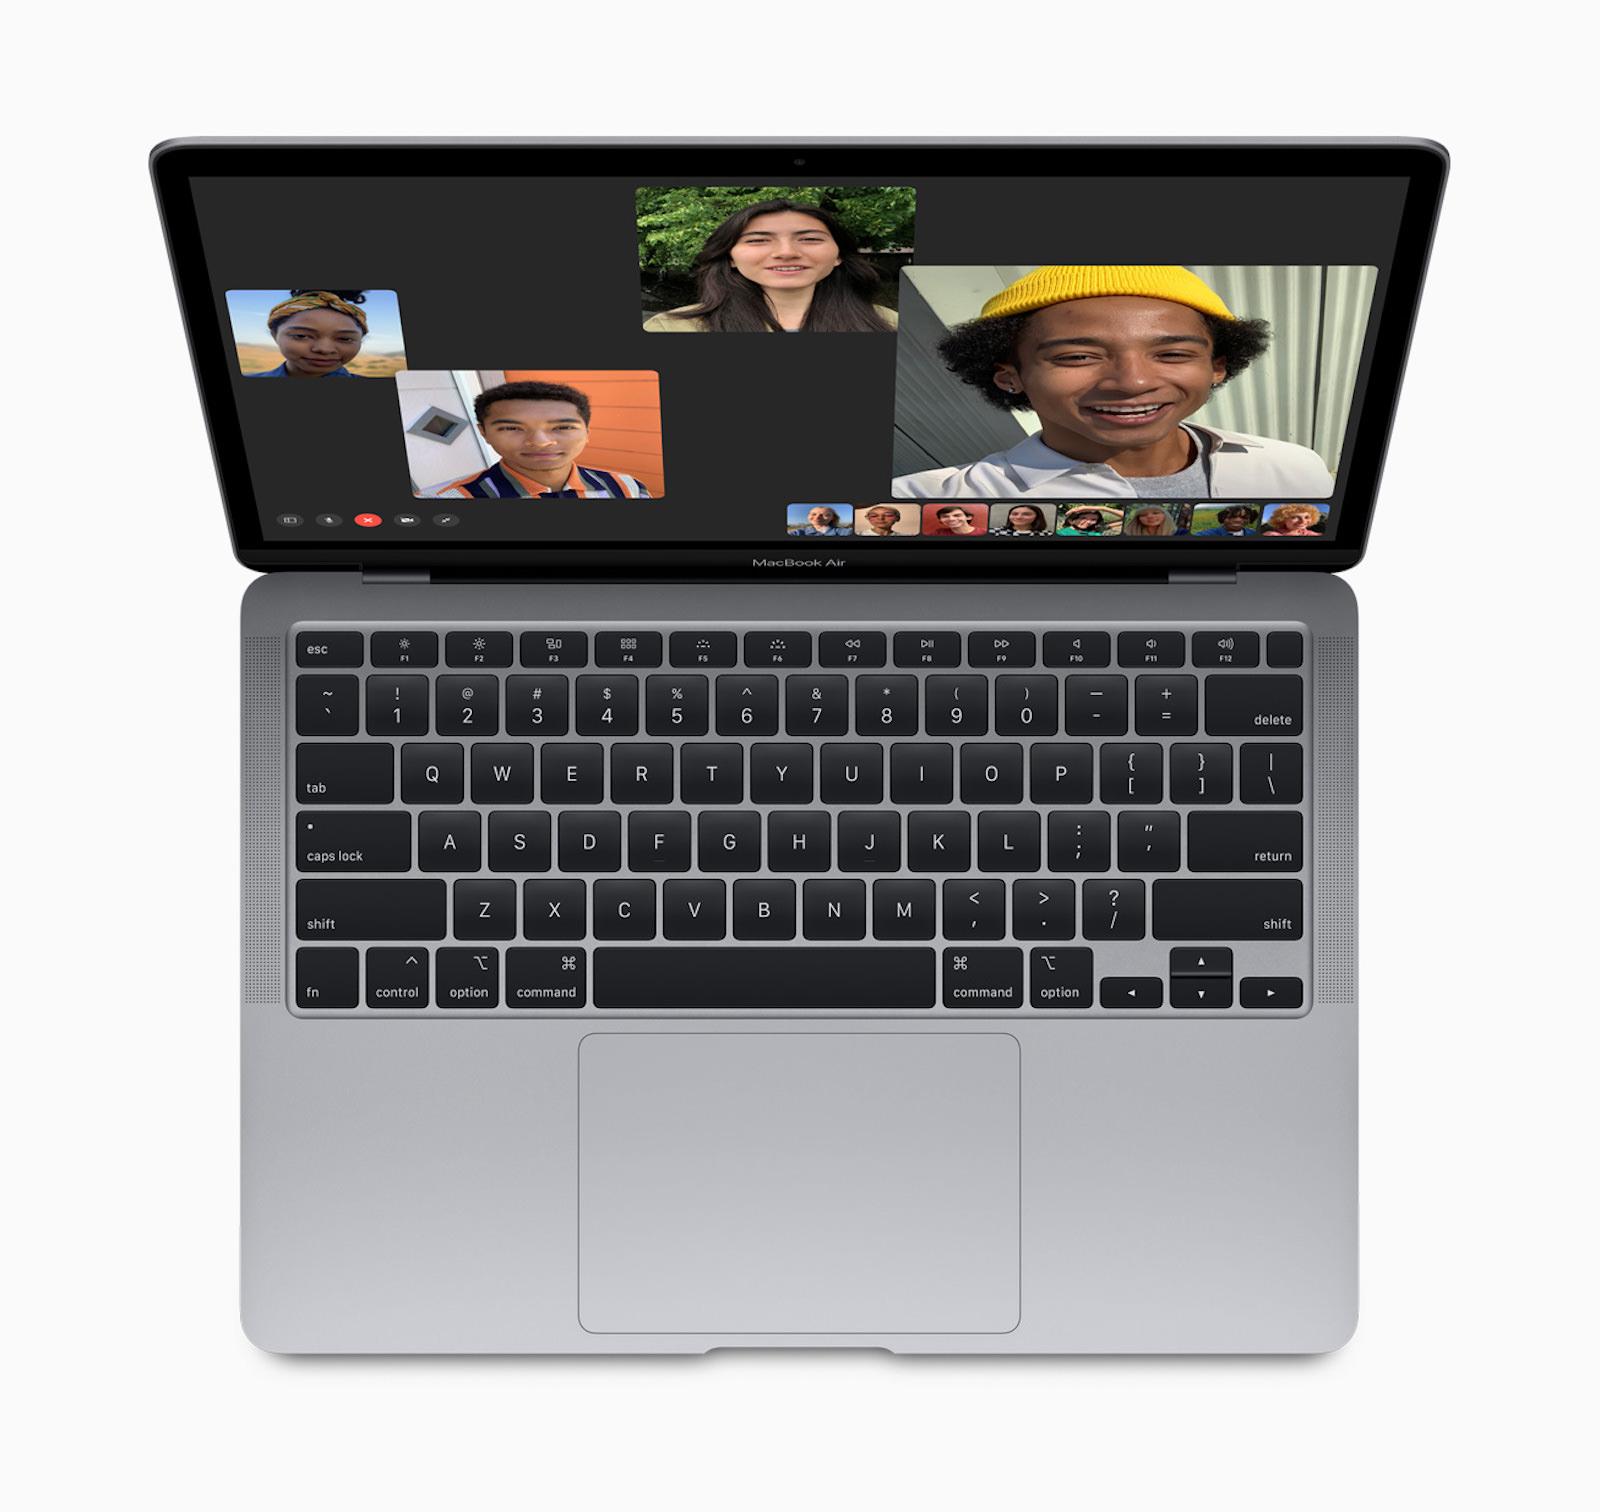 Apple new macbook air facetime screen 03182020